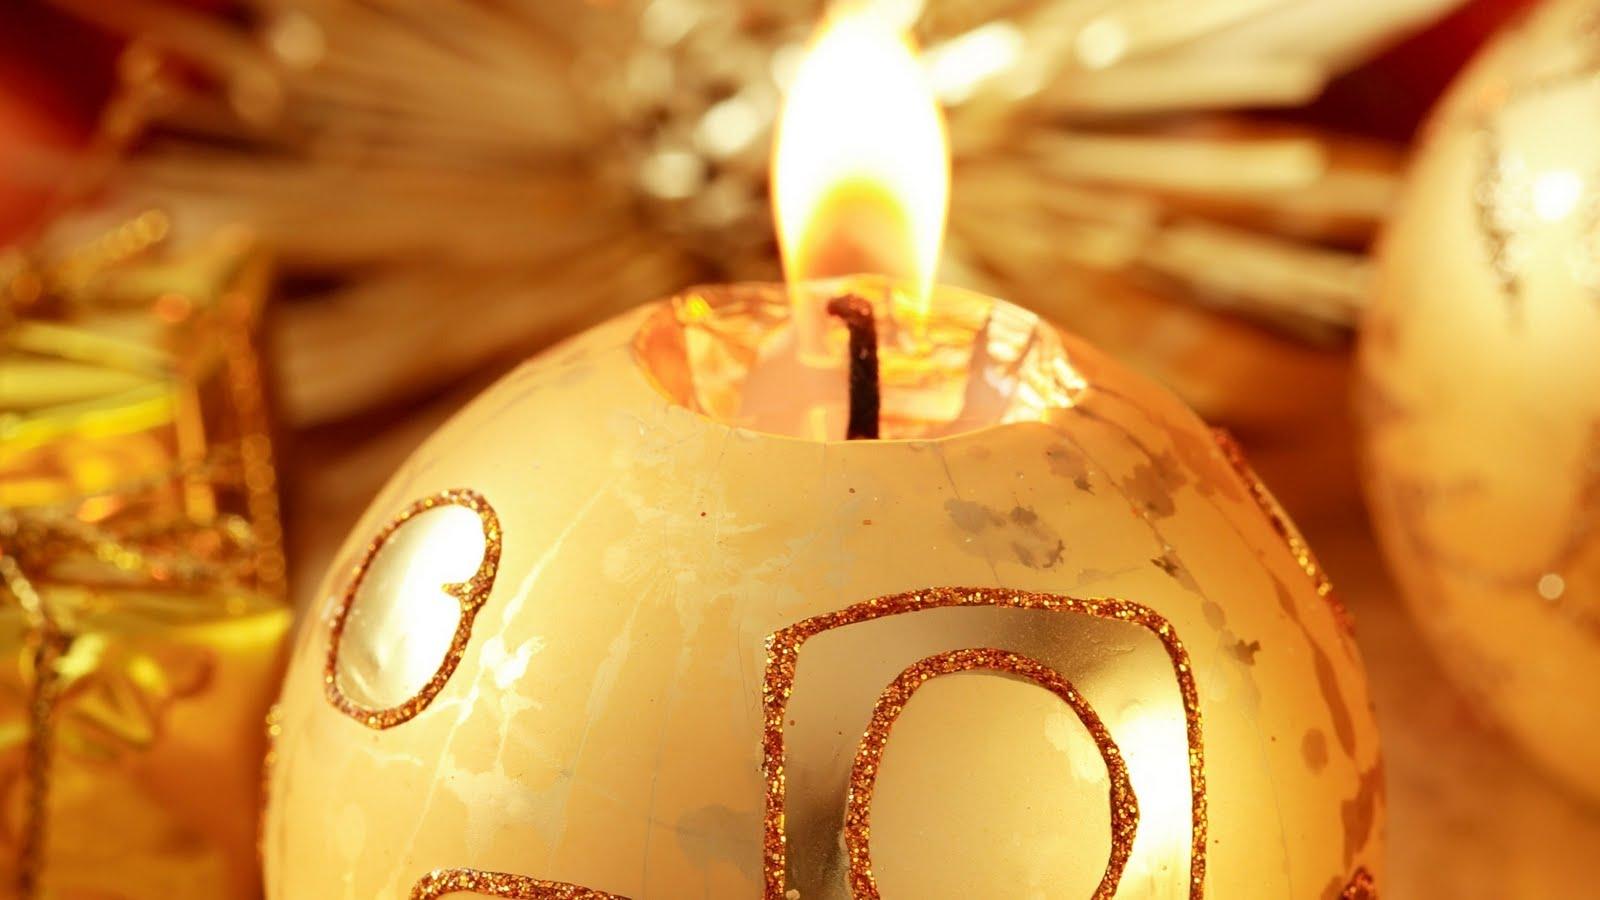 http://4.bp.blogspot.com/-B3VLbWNpRuA/Tn7qIqXx8fI/AAAAAAAAAuU/0PmefylOZ2M/s1600/Christmas%2BGreeting%2BCards%2Bfree.jpg